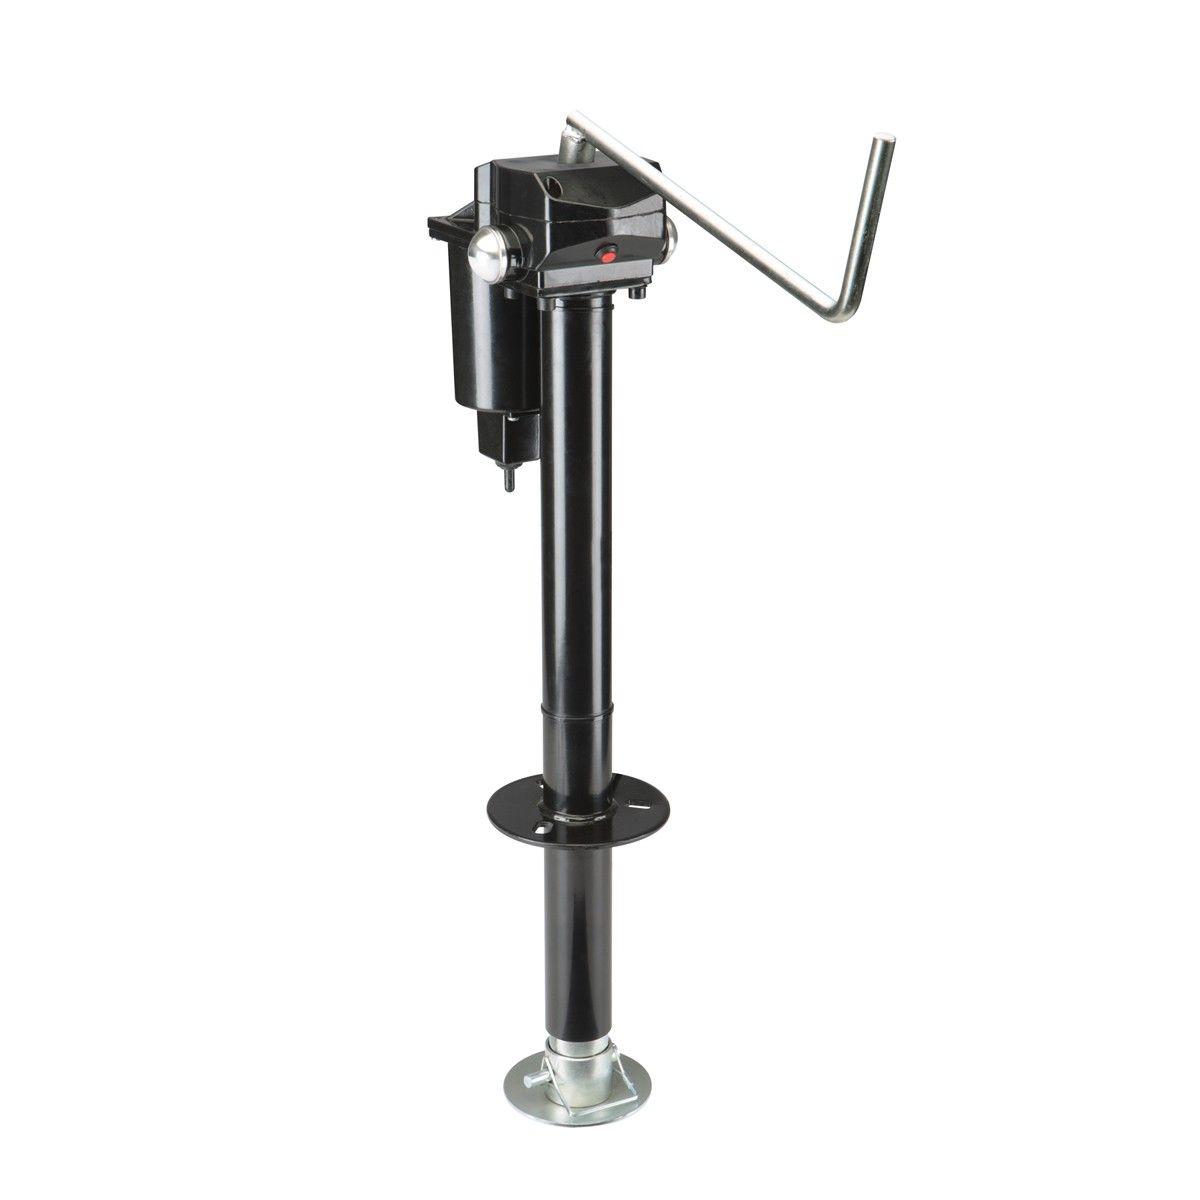 Haul Master 69899 3500 Lb Capacity Electric Trailer Jack